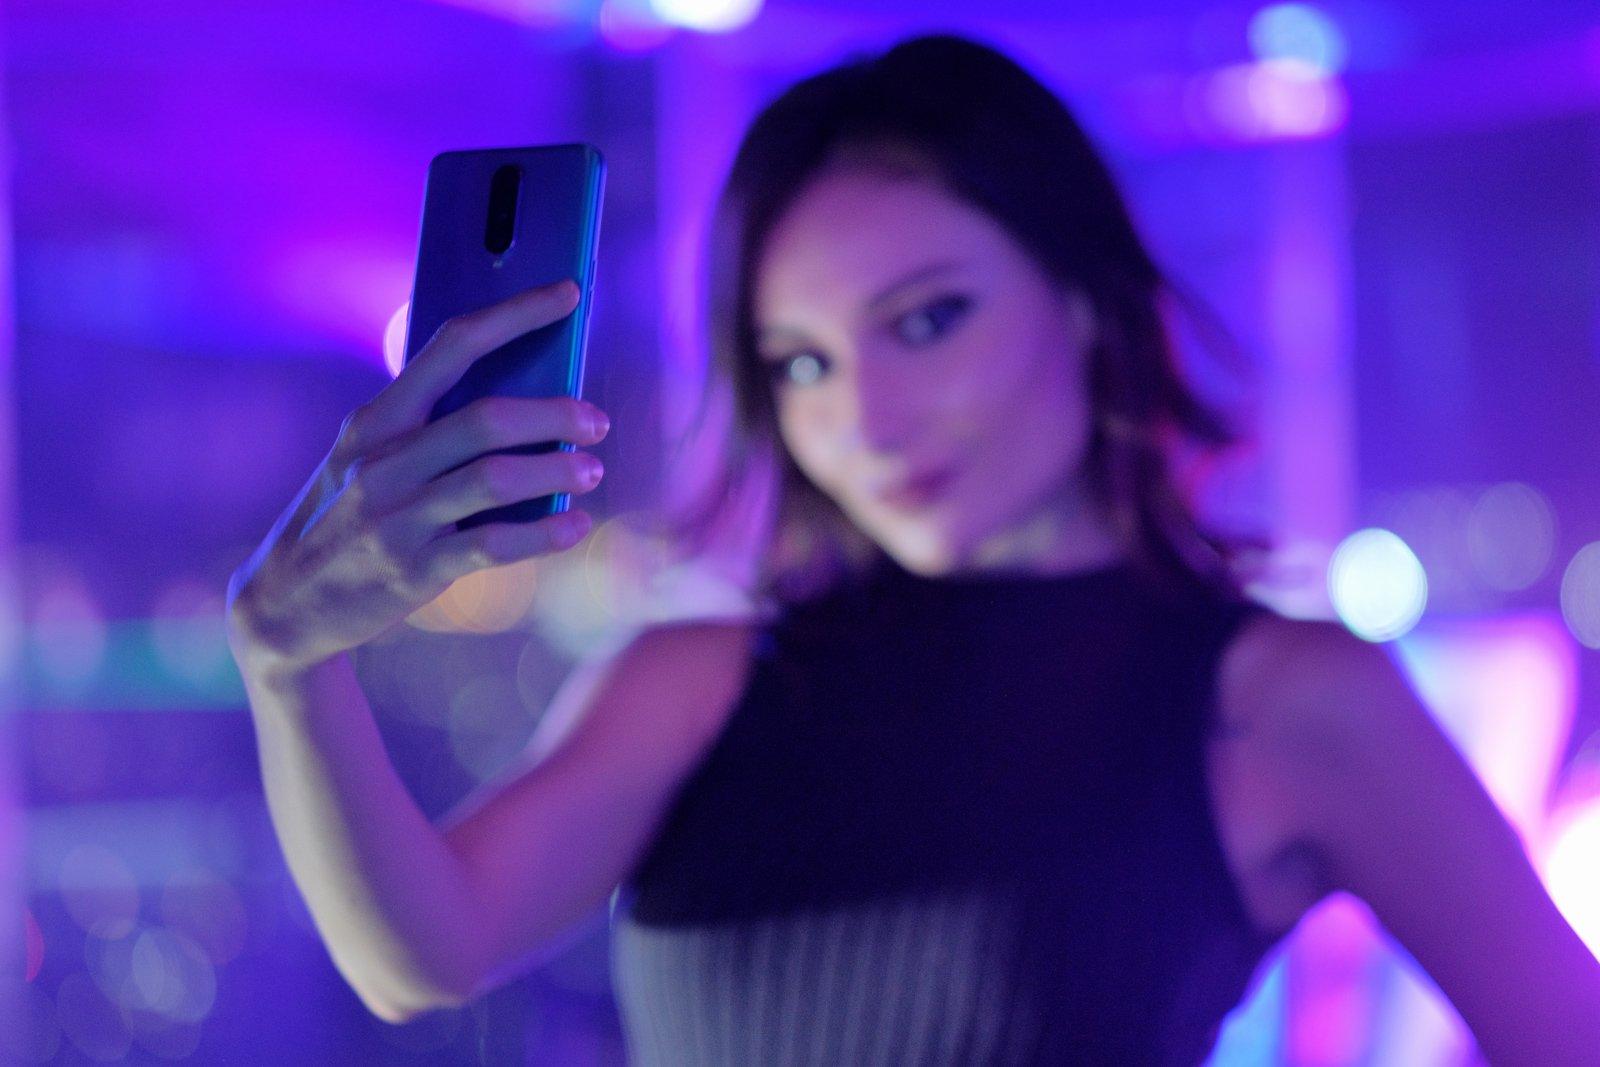 Review Kamera OPPO R17 Pro: Andalkan  Tiga Kamera Belakang dengan Ultra Night Mode 4 harga, hasil foto oppo r17 pro, kamera oppo r17 pro, oppo, r17 pro, review, spesifikasi, ultra night mode